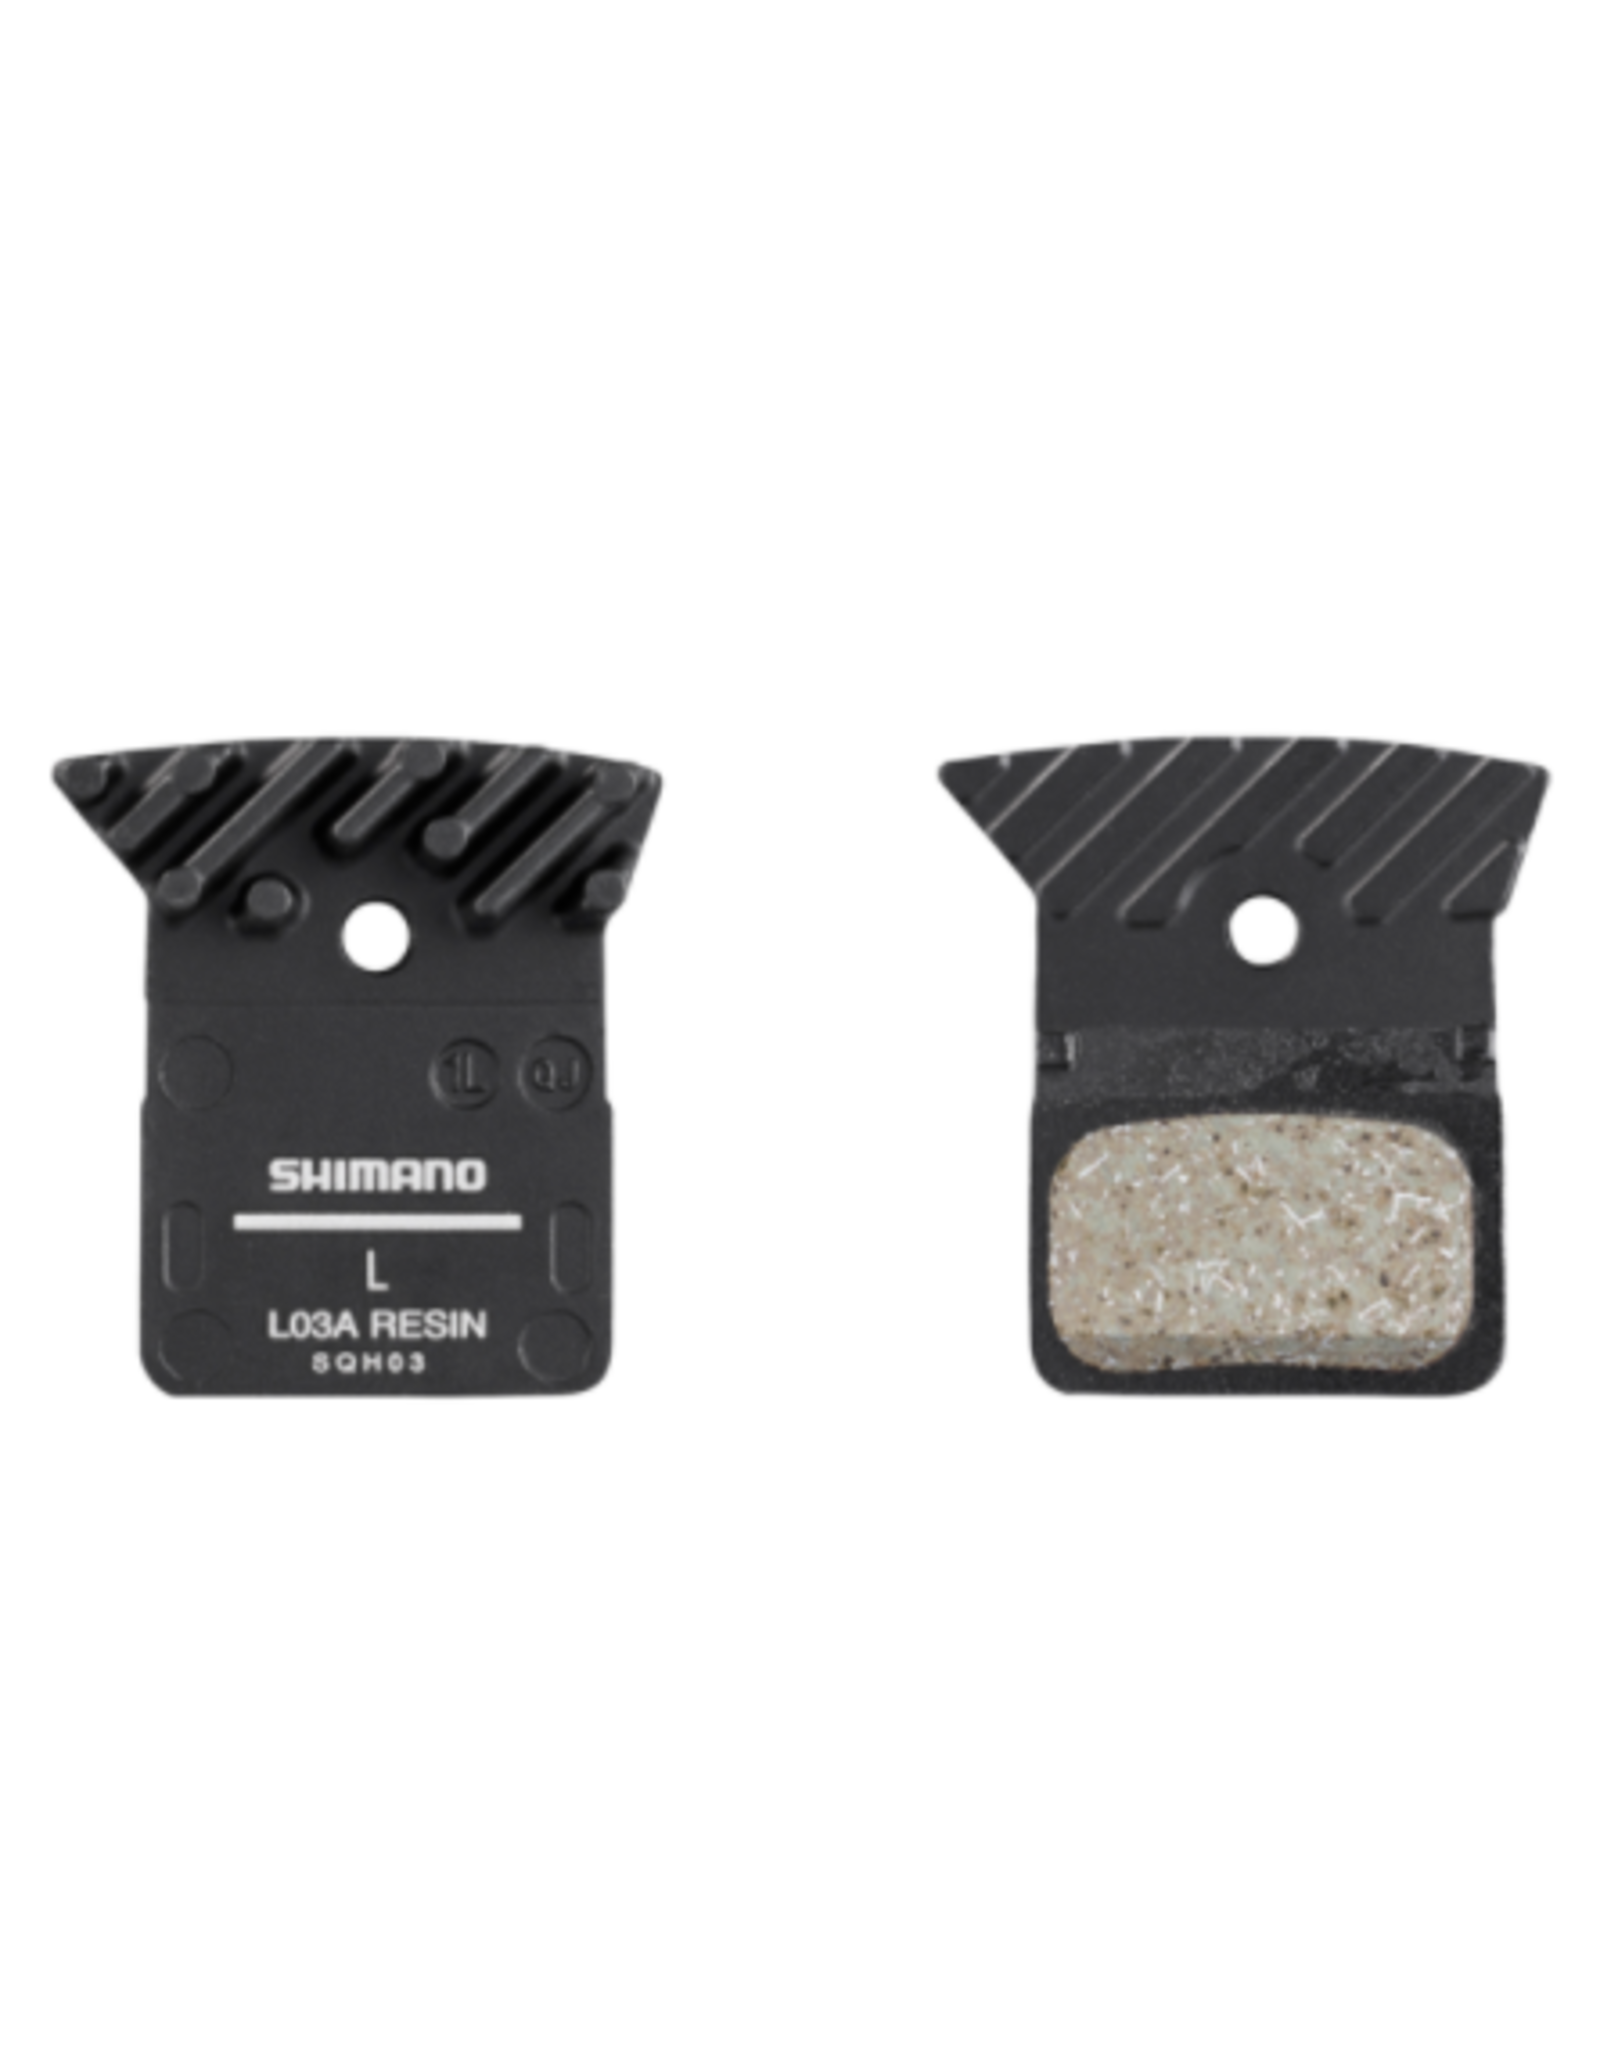 Shimano Brake pads Shim L03A resin Ice tech (Dura/Ulte/105)